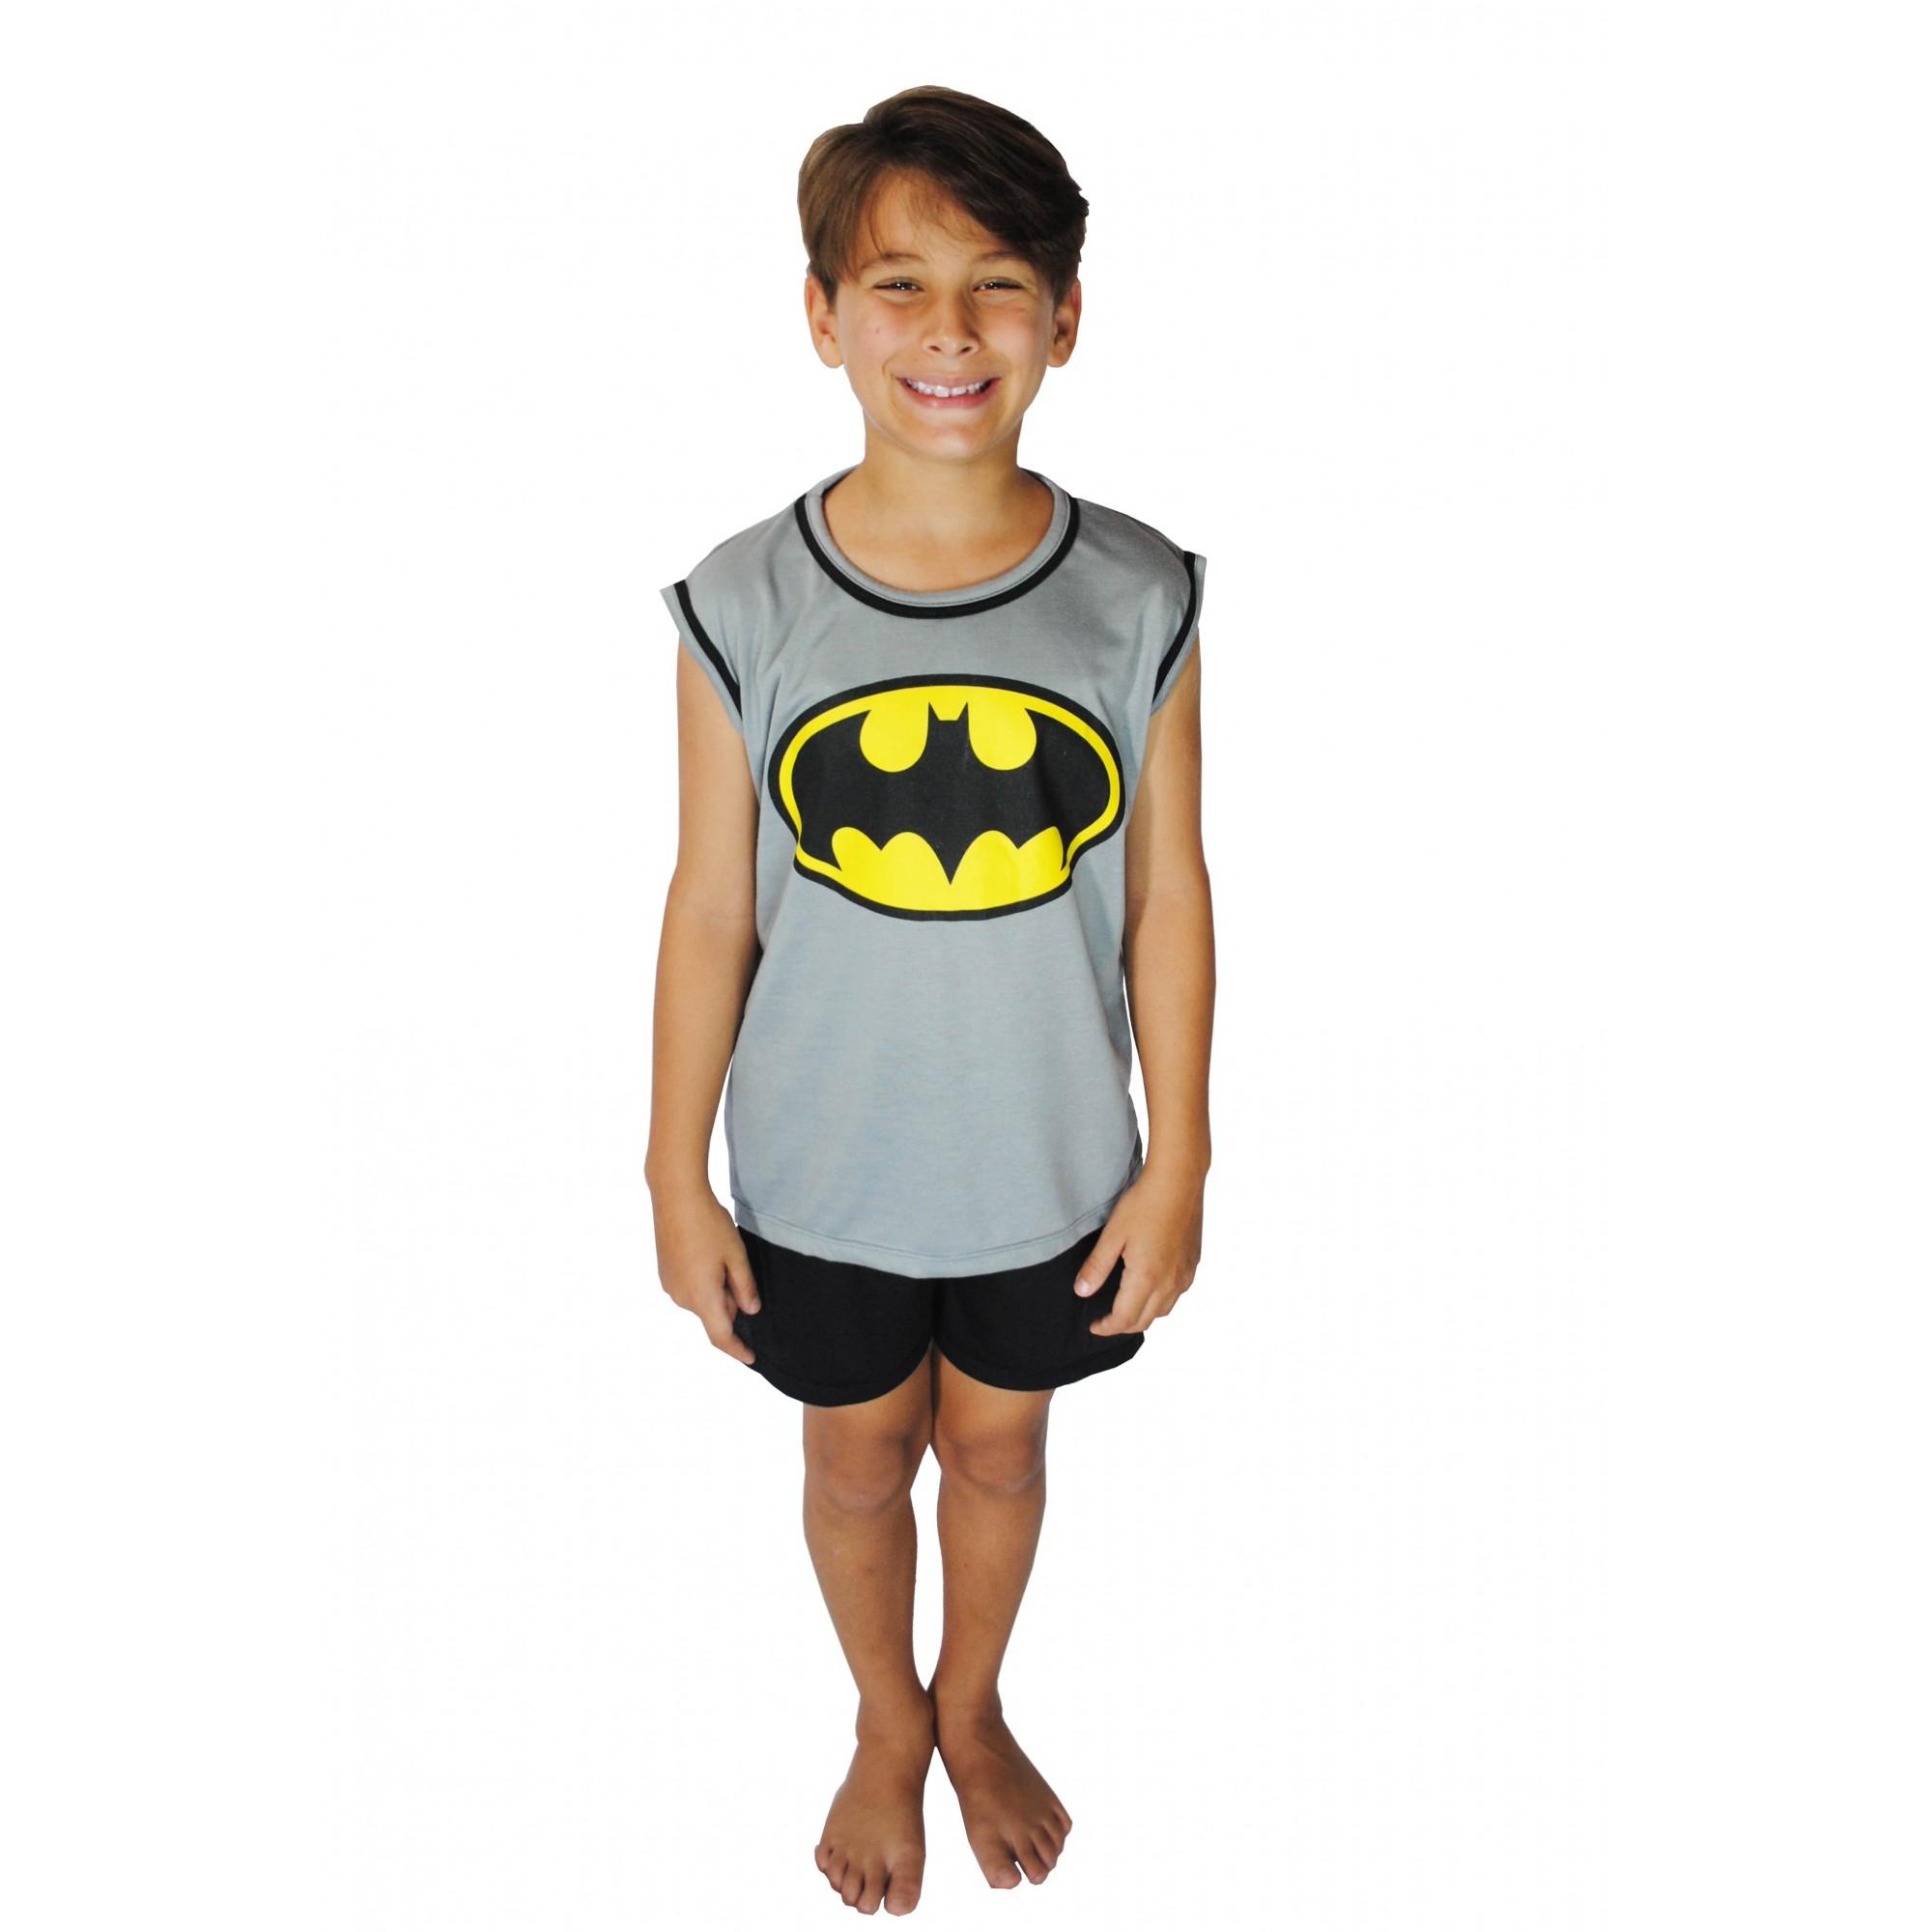 Pijama Regata Short Masculino Infantil Menino Batman Liga da Justiça Ref 356